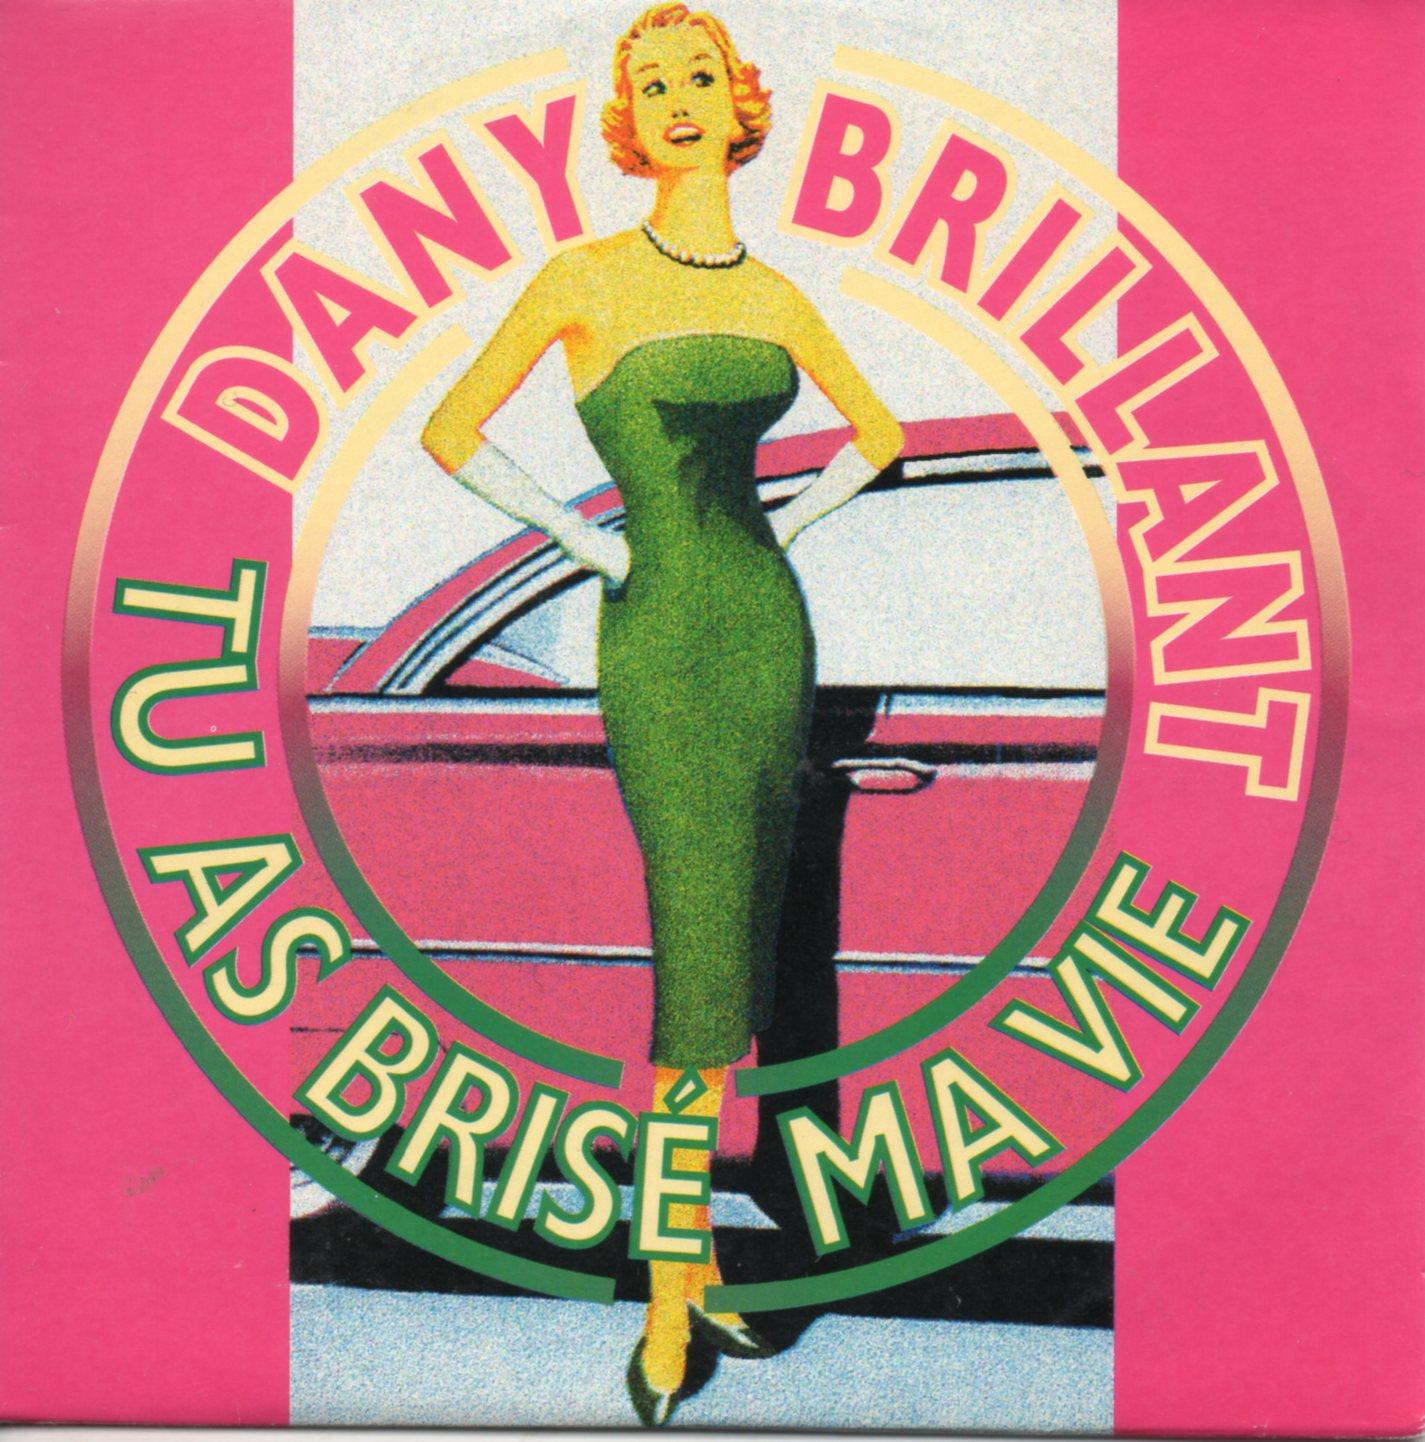 DANY BRILLANT - Tu as brisé ma vie 2-track CARD SLEEVE - CD single